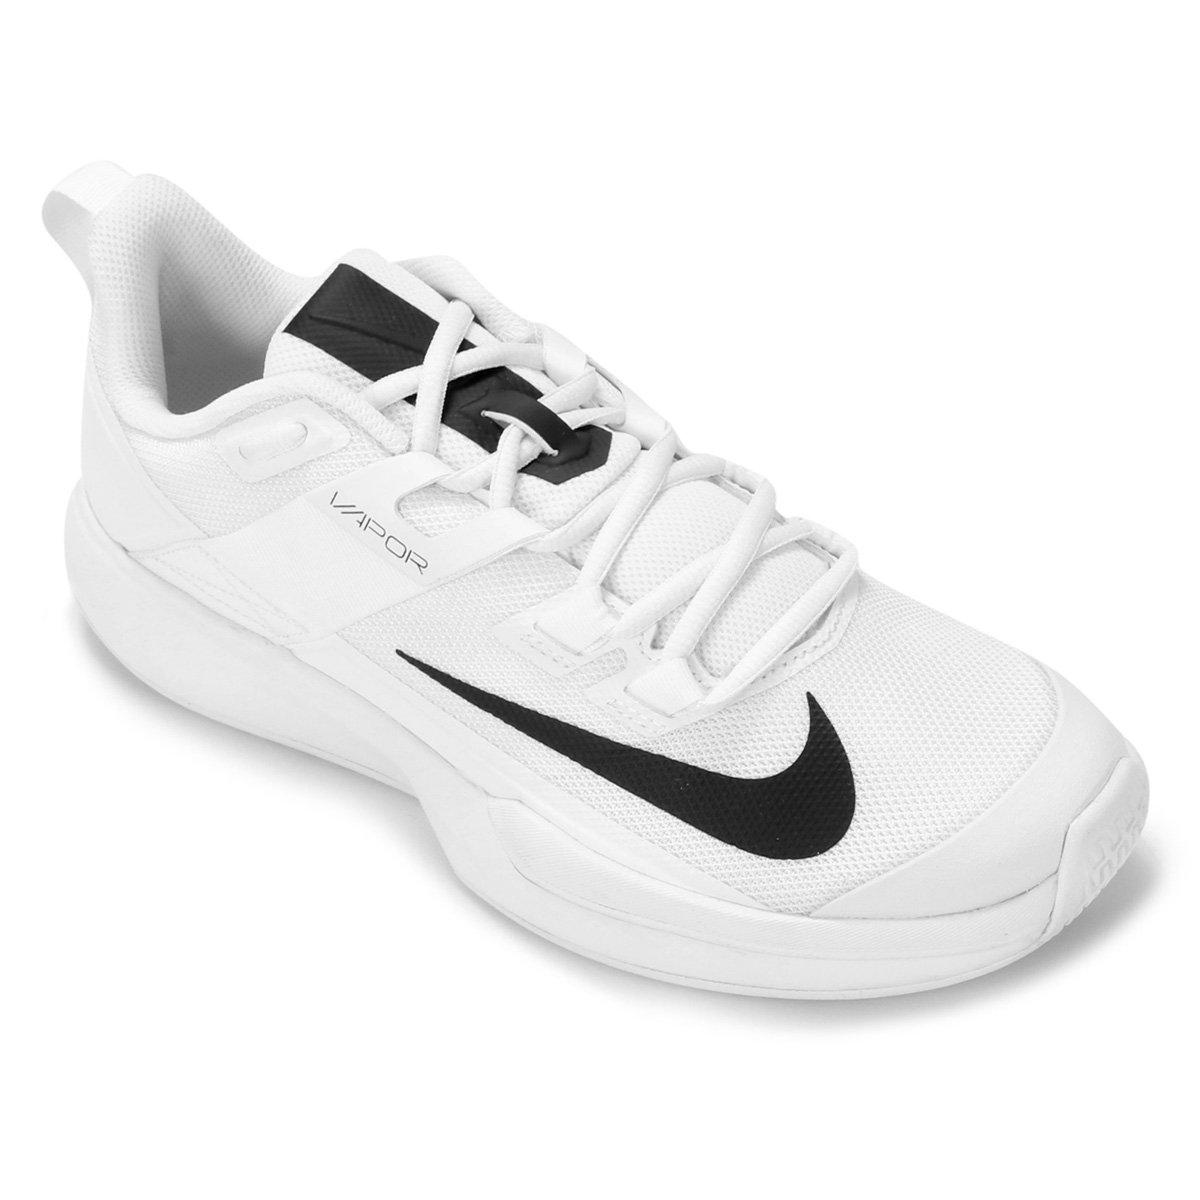 Tênis Nike Vapor Lite HC Masculino